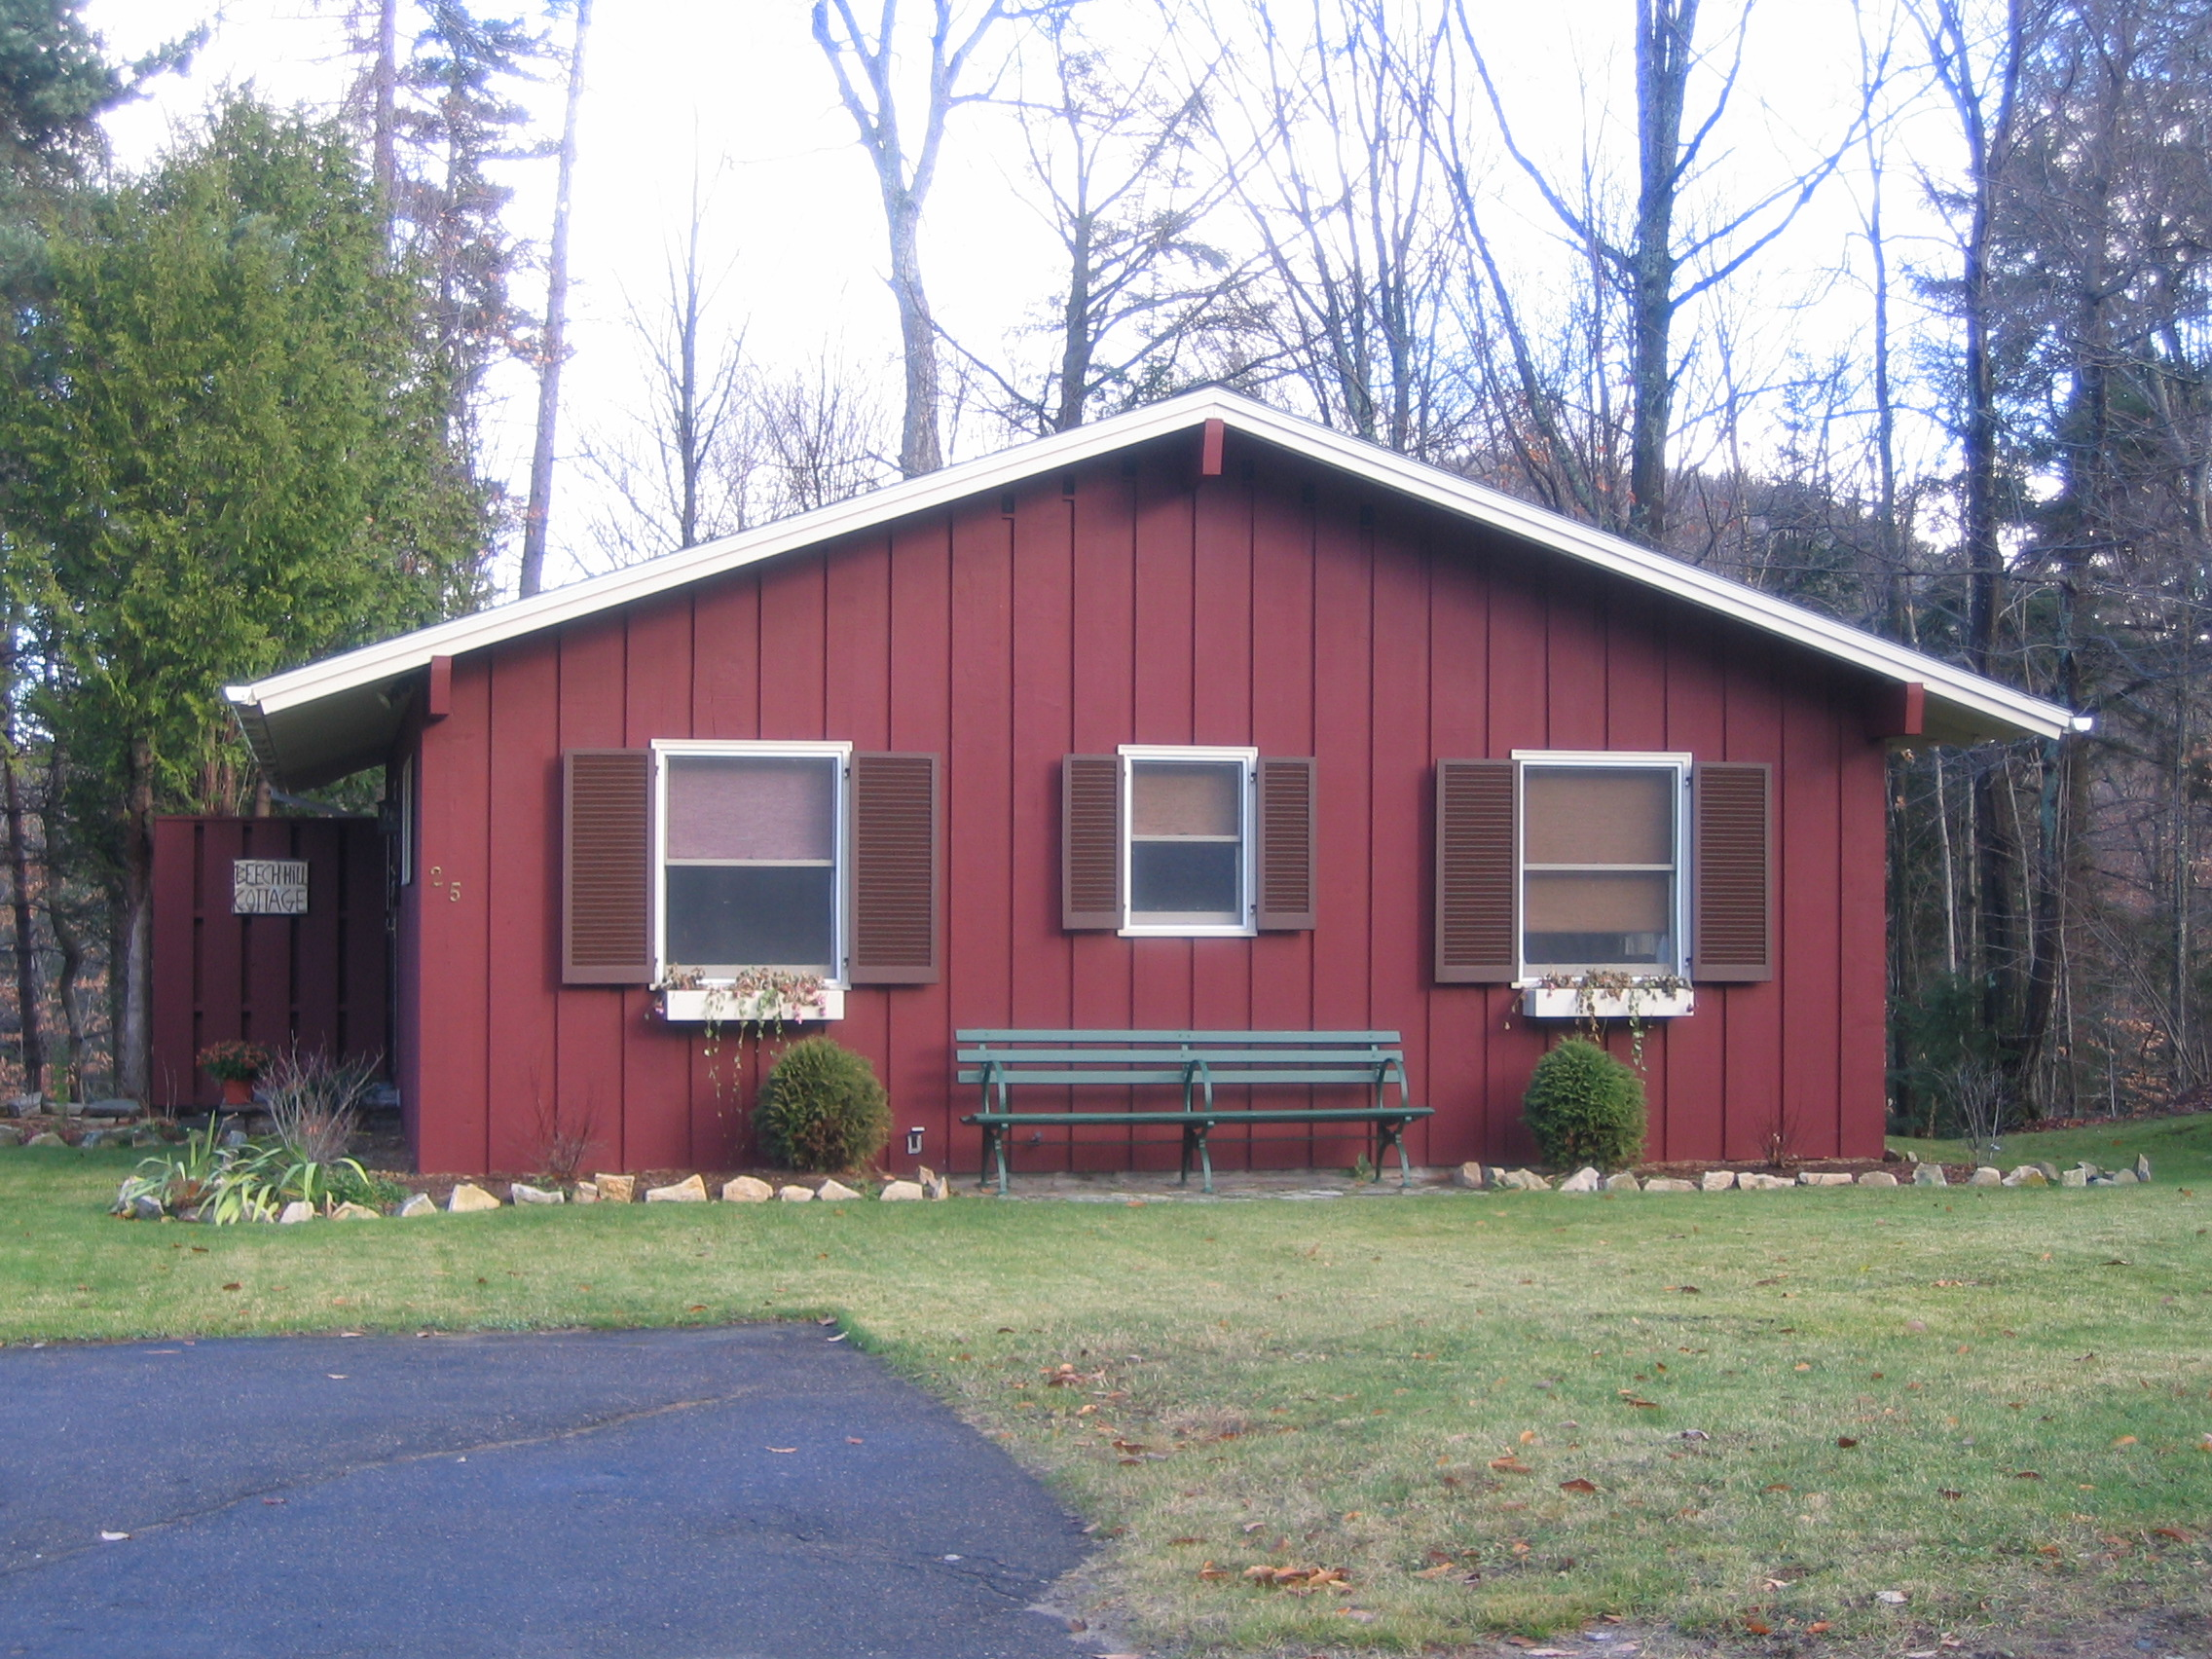 rentals properties featured all cabin adirondacks adirondack american ny vacation chestertown rentaldetail cabins